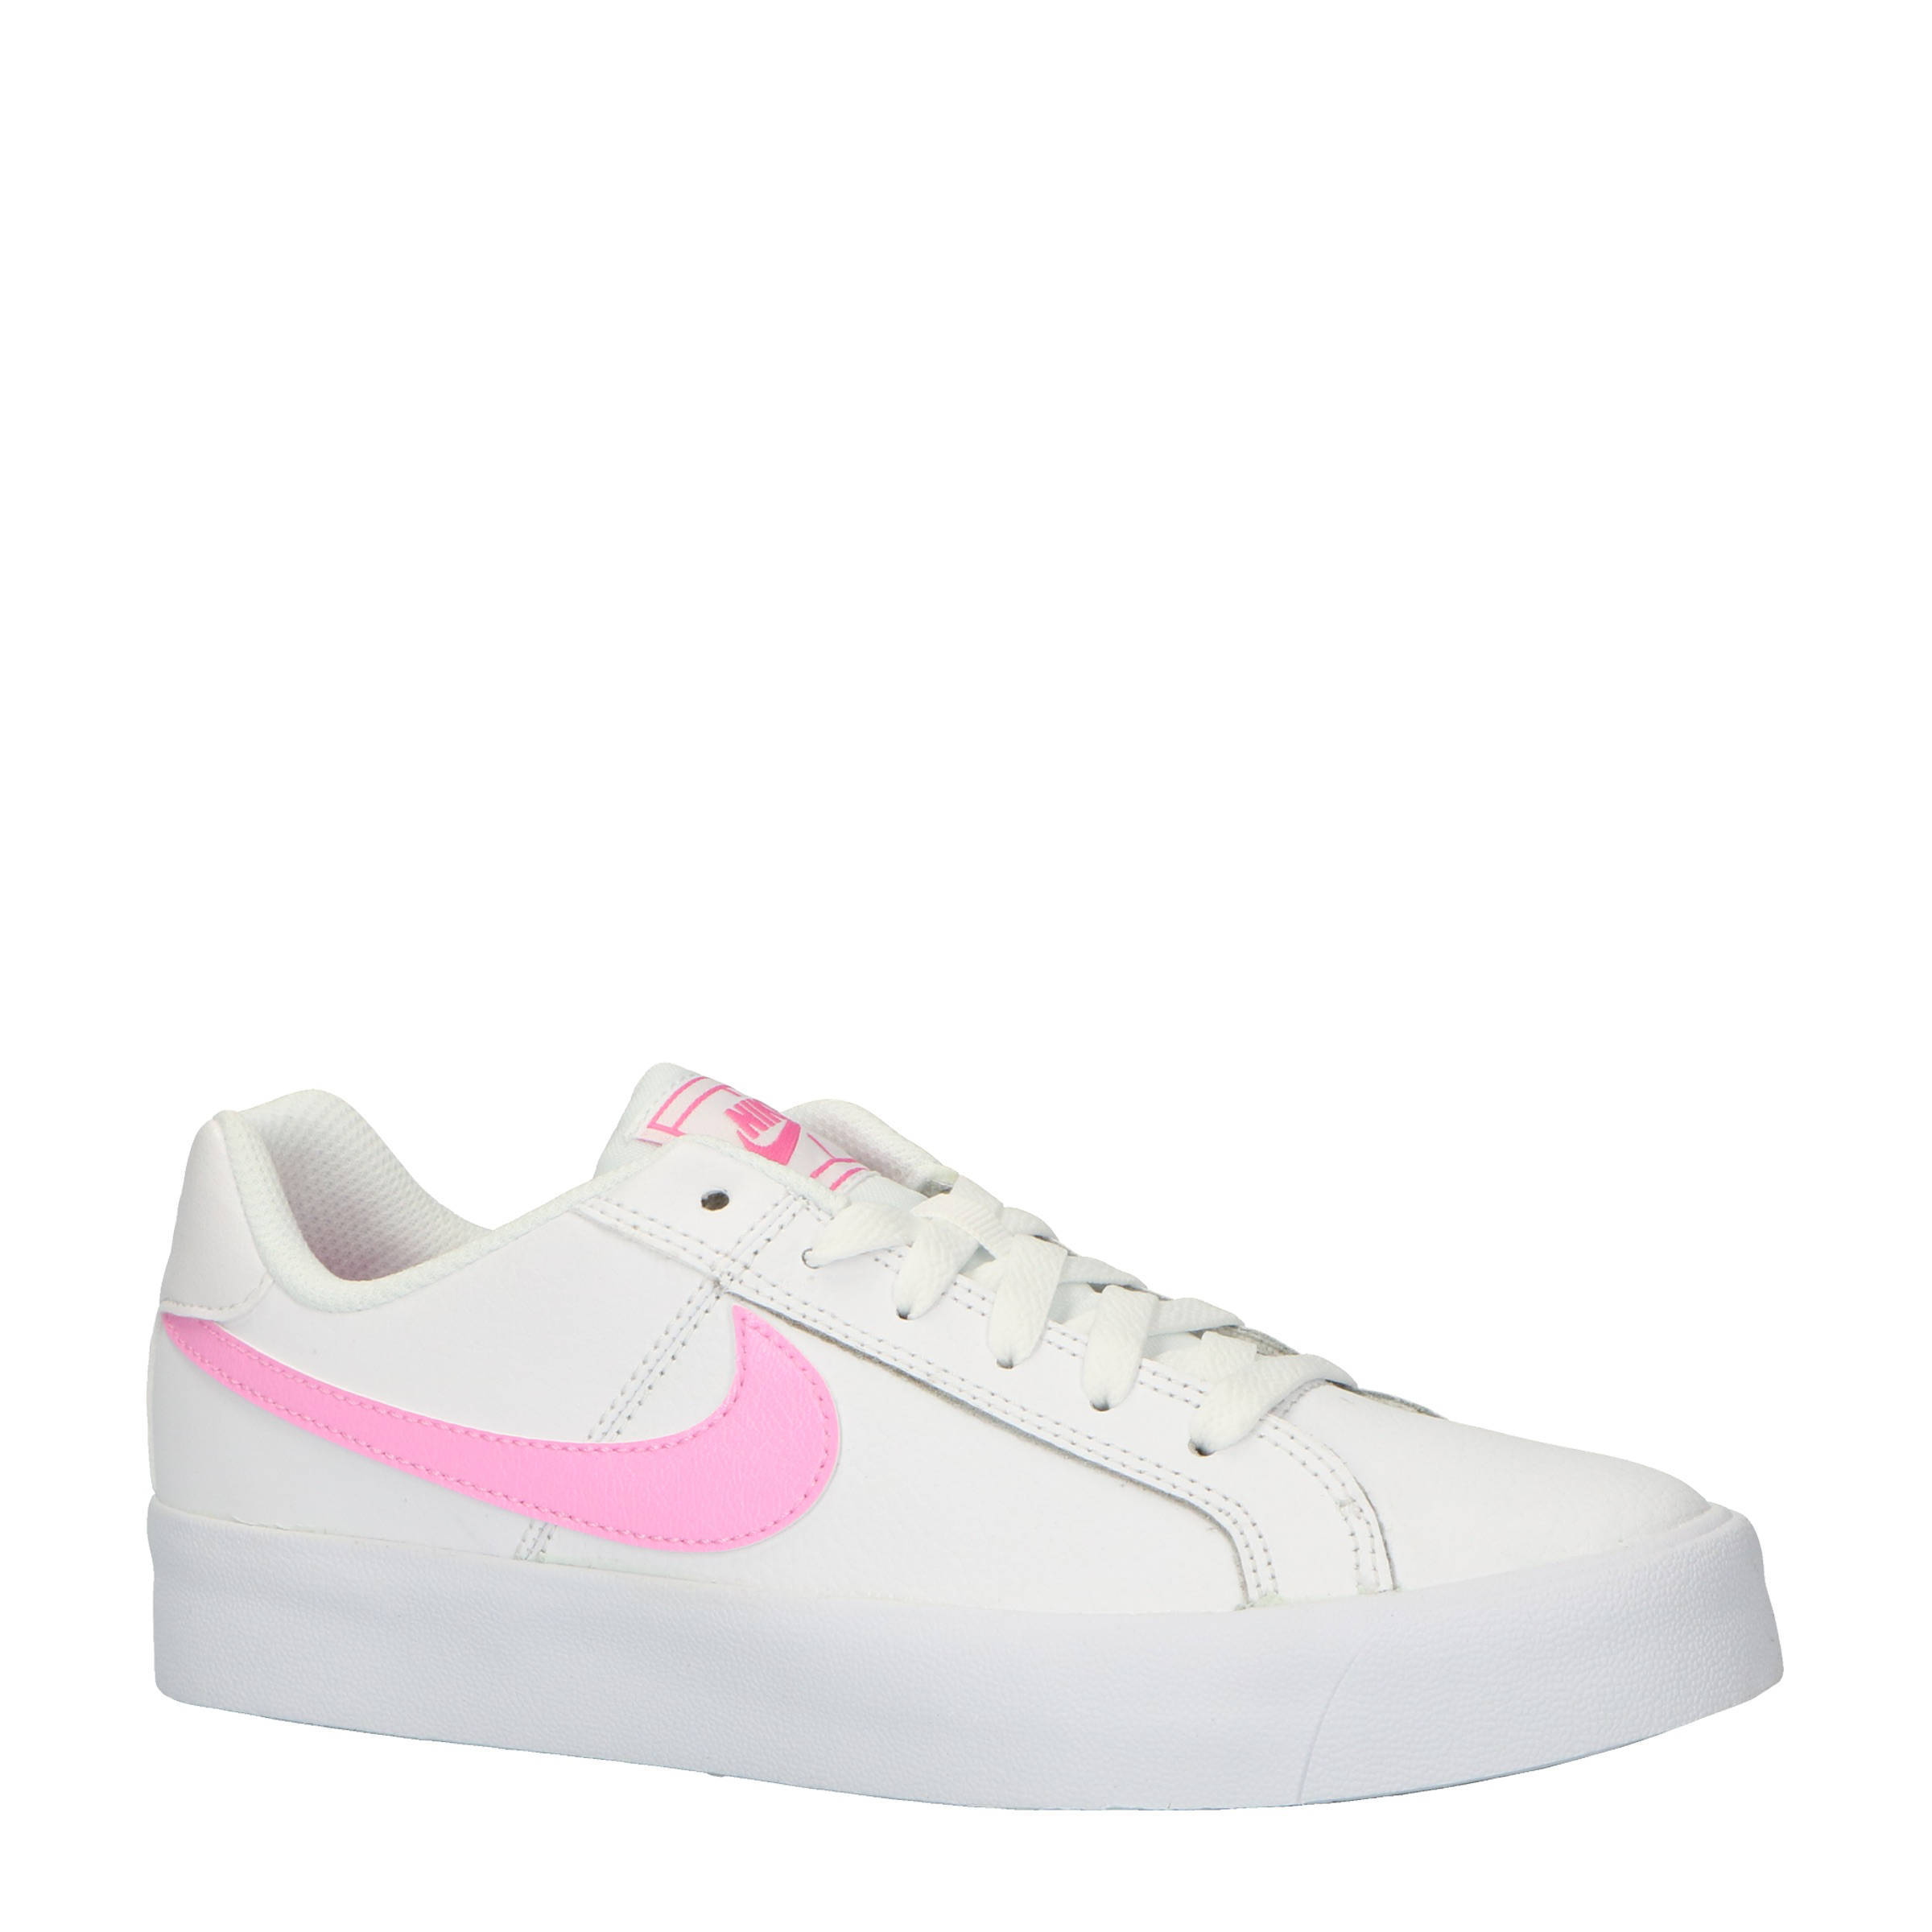 Nike Court Royale AC leren sneakers wit/roze   wehkamp